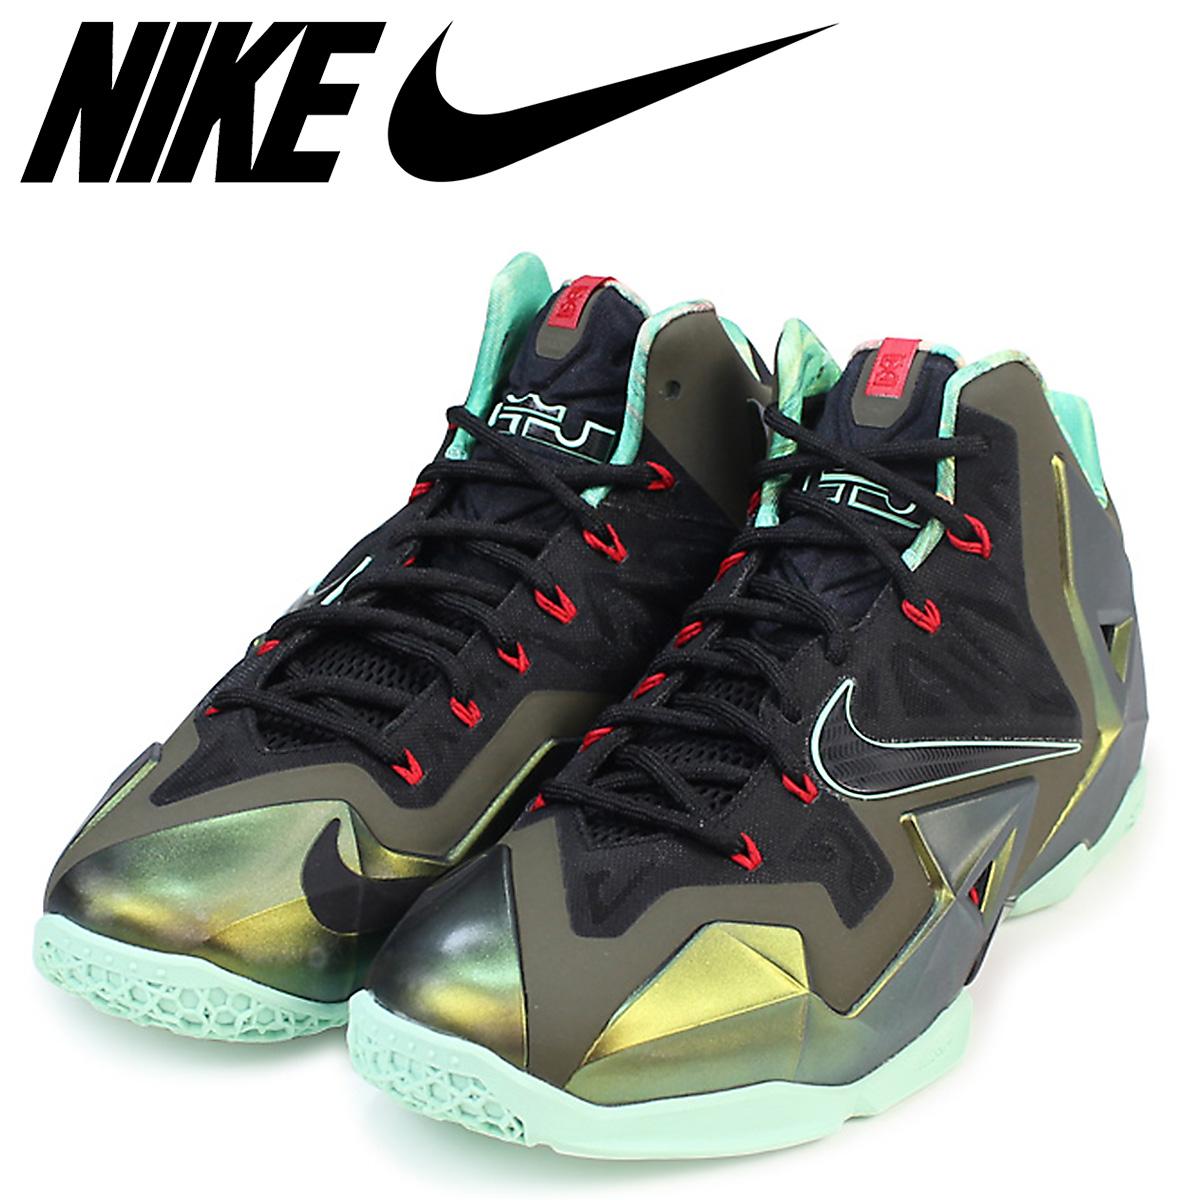 pretty nice 56c01 78713 Nike NIKE Revlon 11 sneakers LEBRON 11 KINGS PRIDE men 616,175-700 shoes  gold Revlon ...